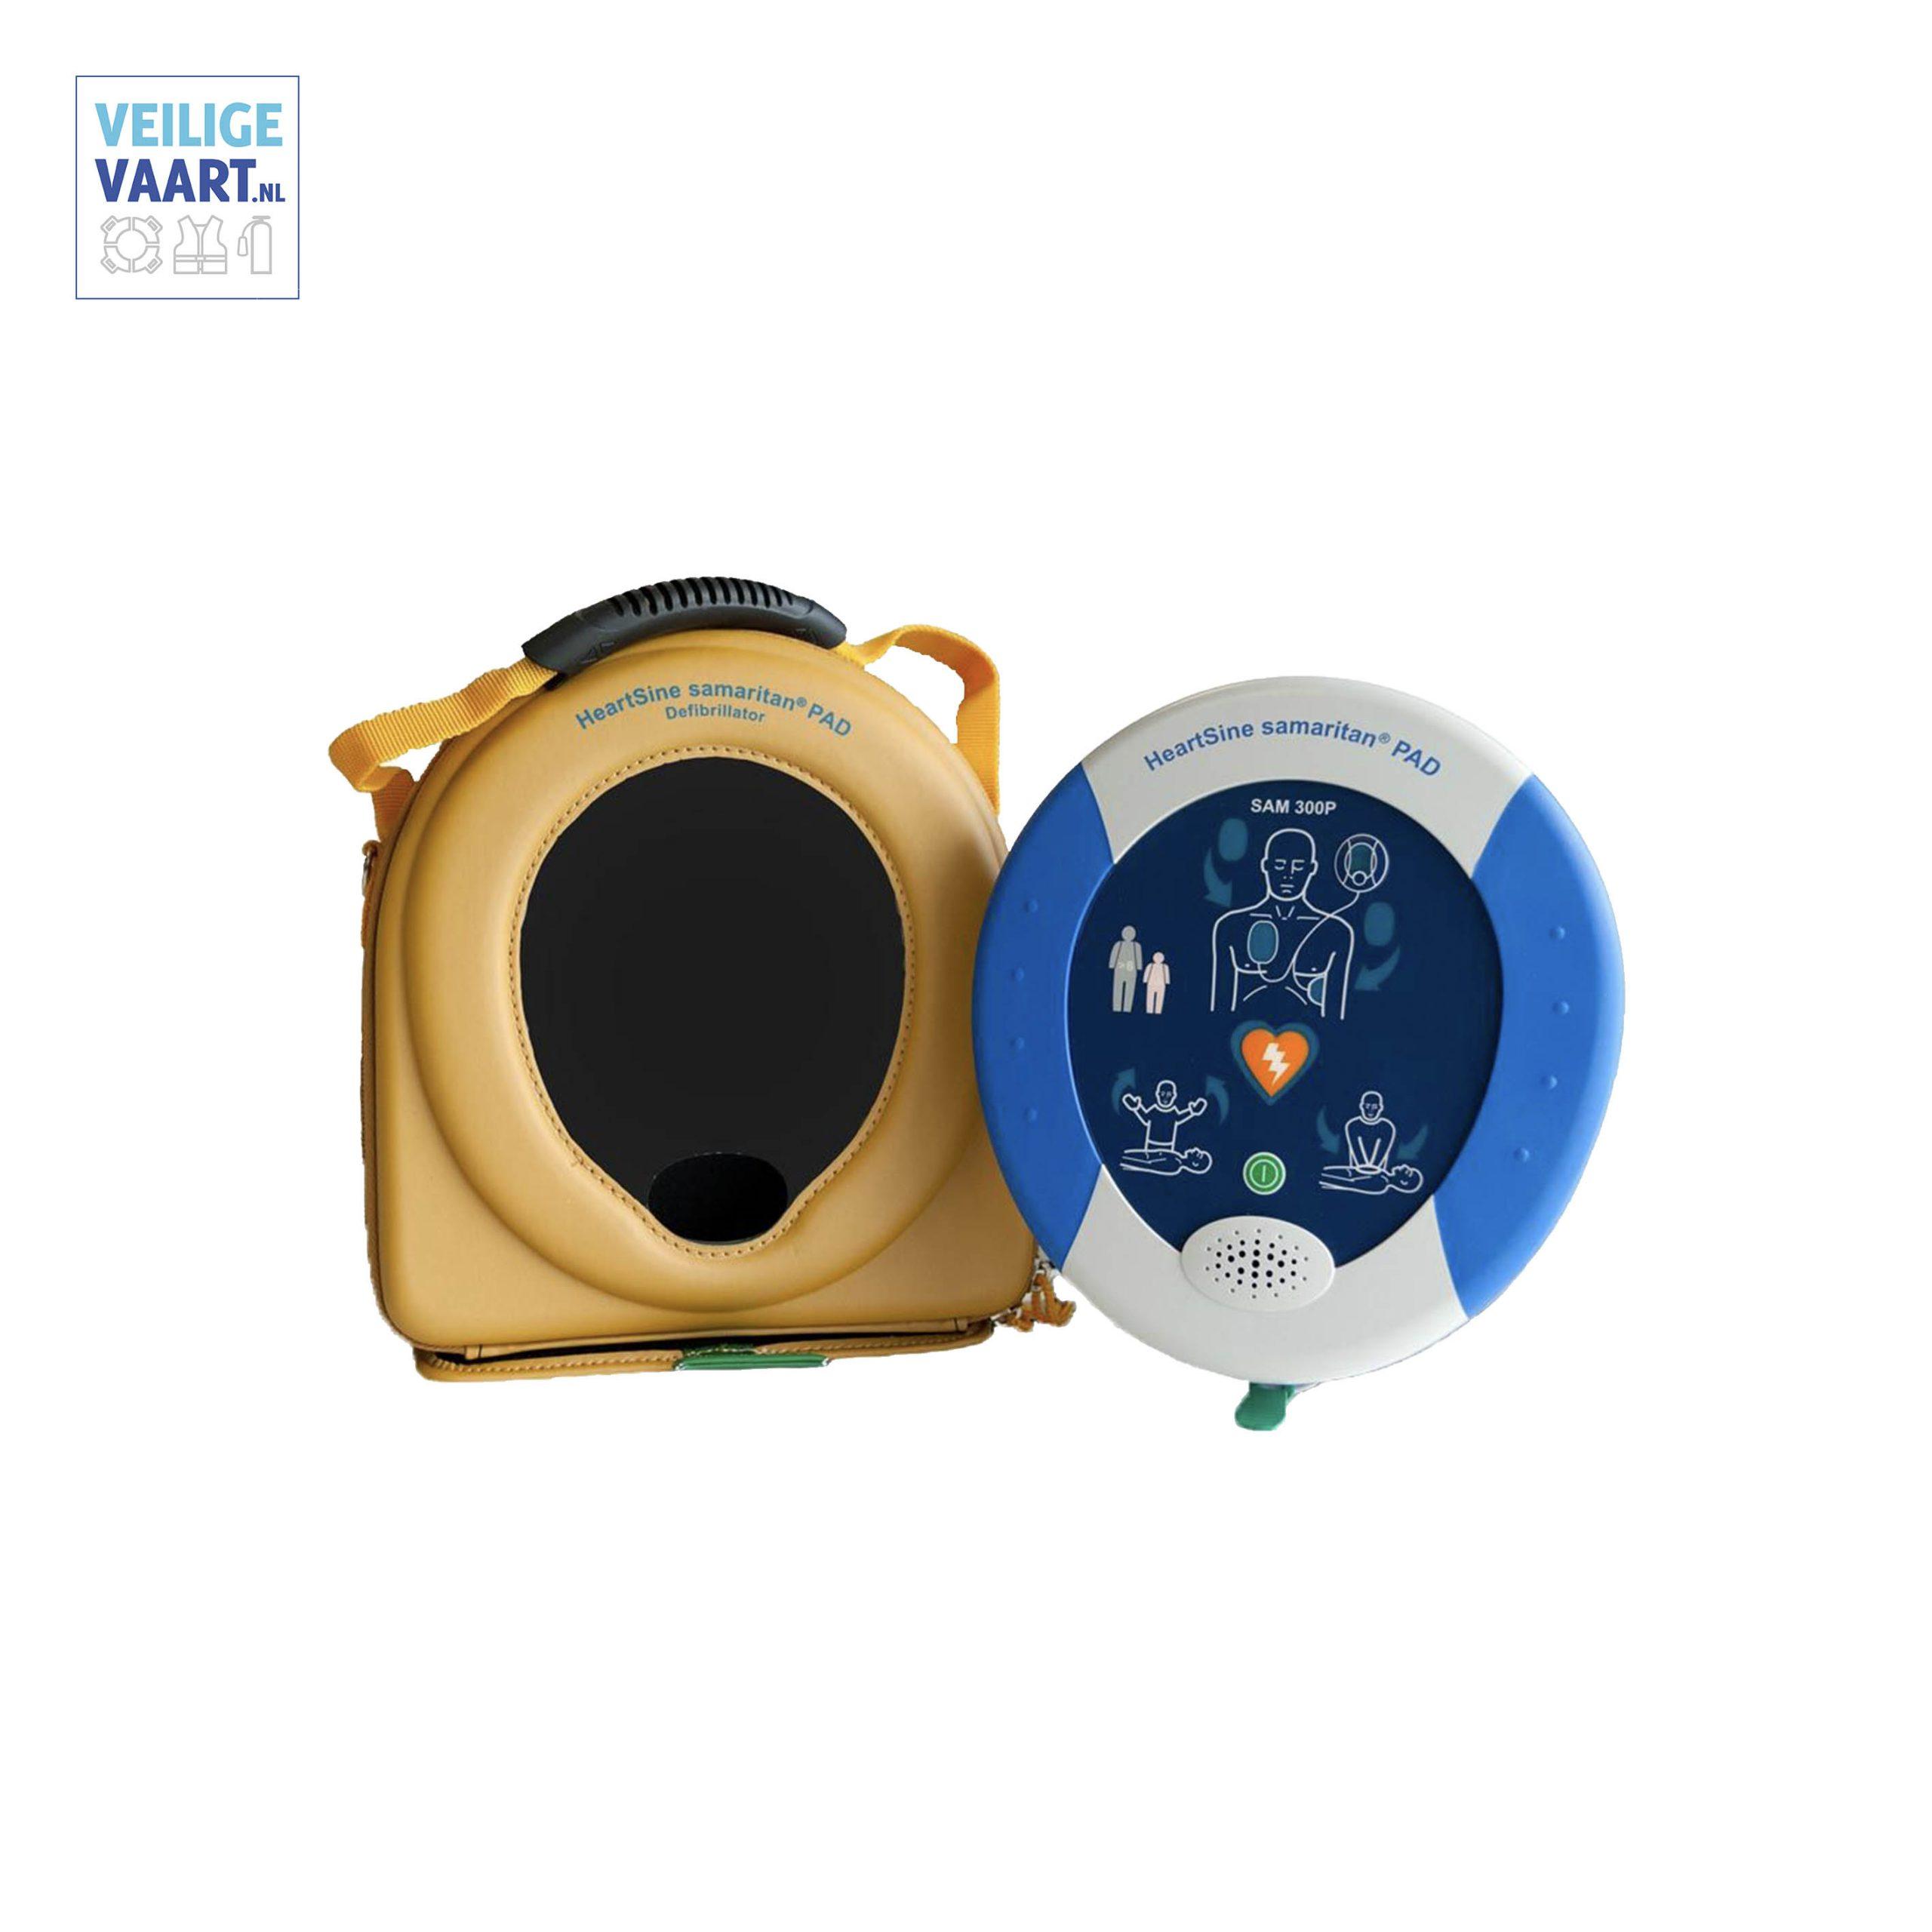 AED HeartSine Samaritan 300 - 350 - 360